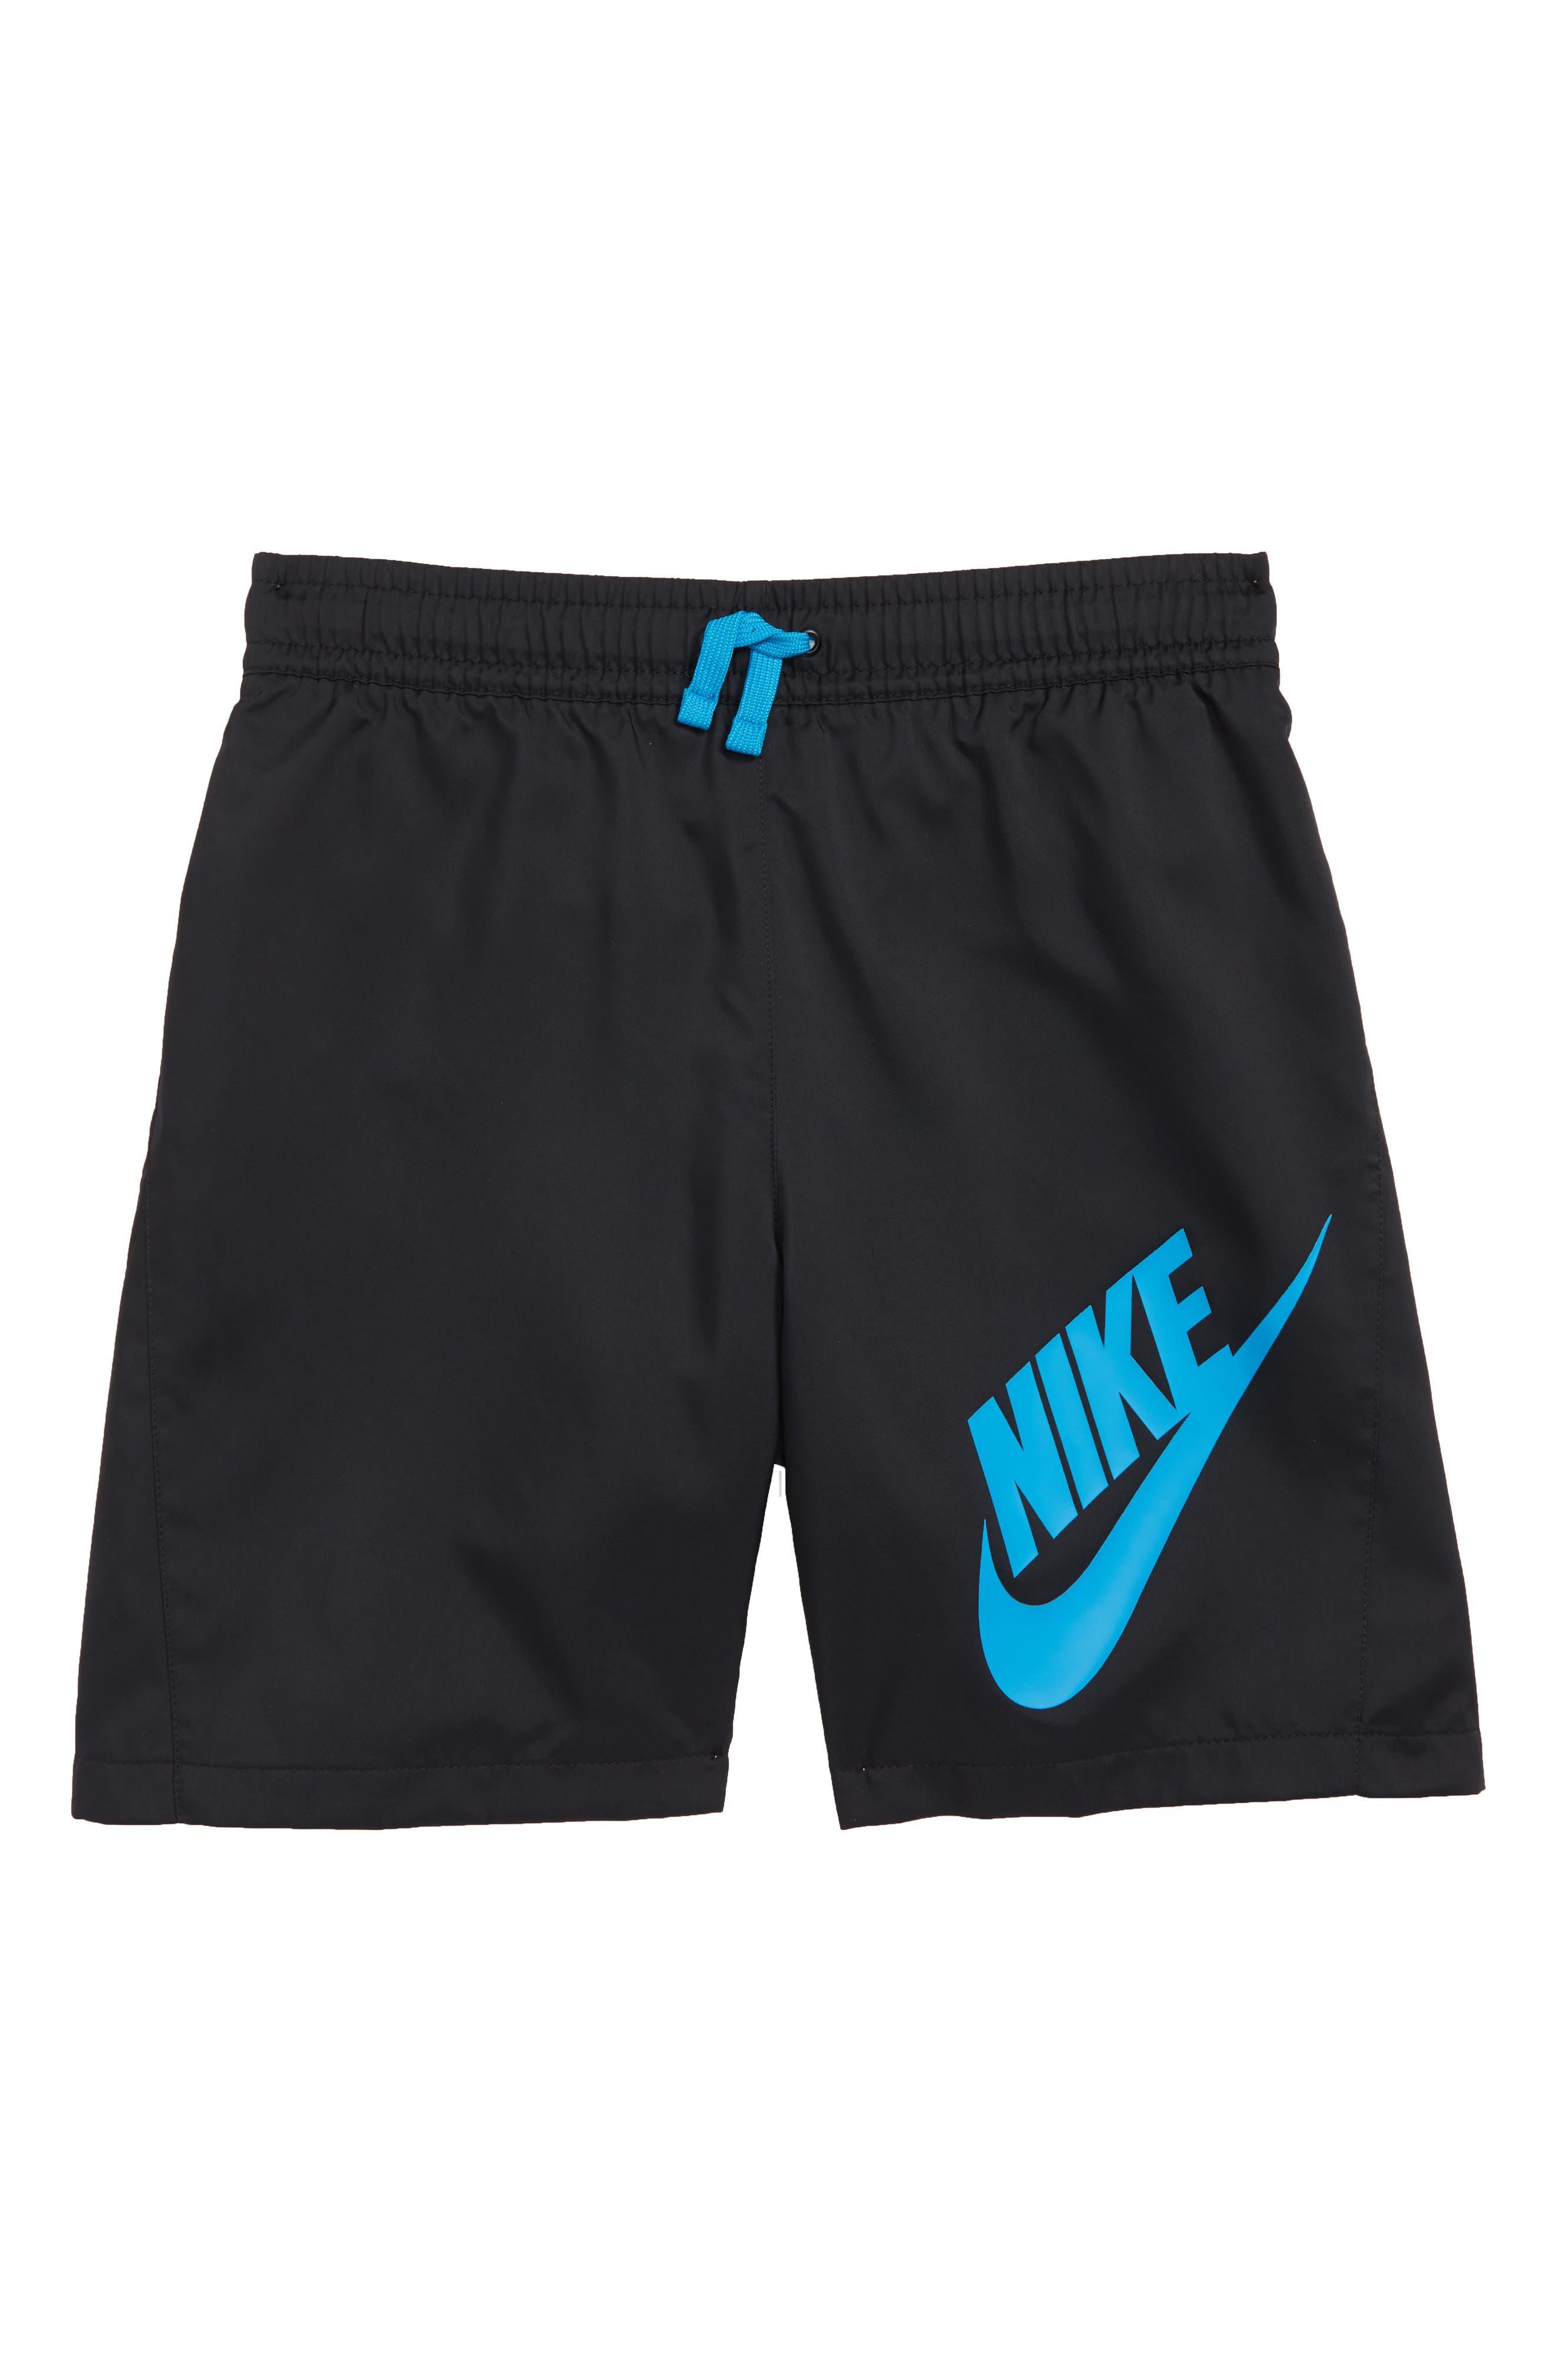 Woven Shorts,                             Main thumbnail 1, color,                             Black/ Equator Blue